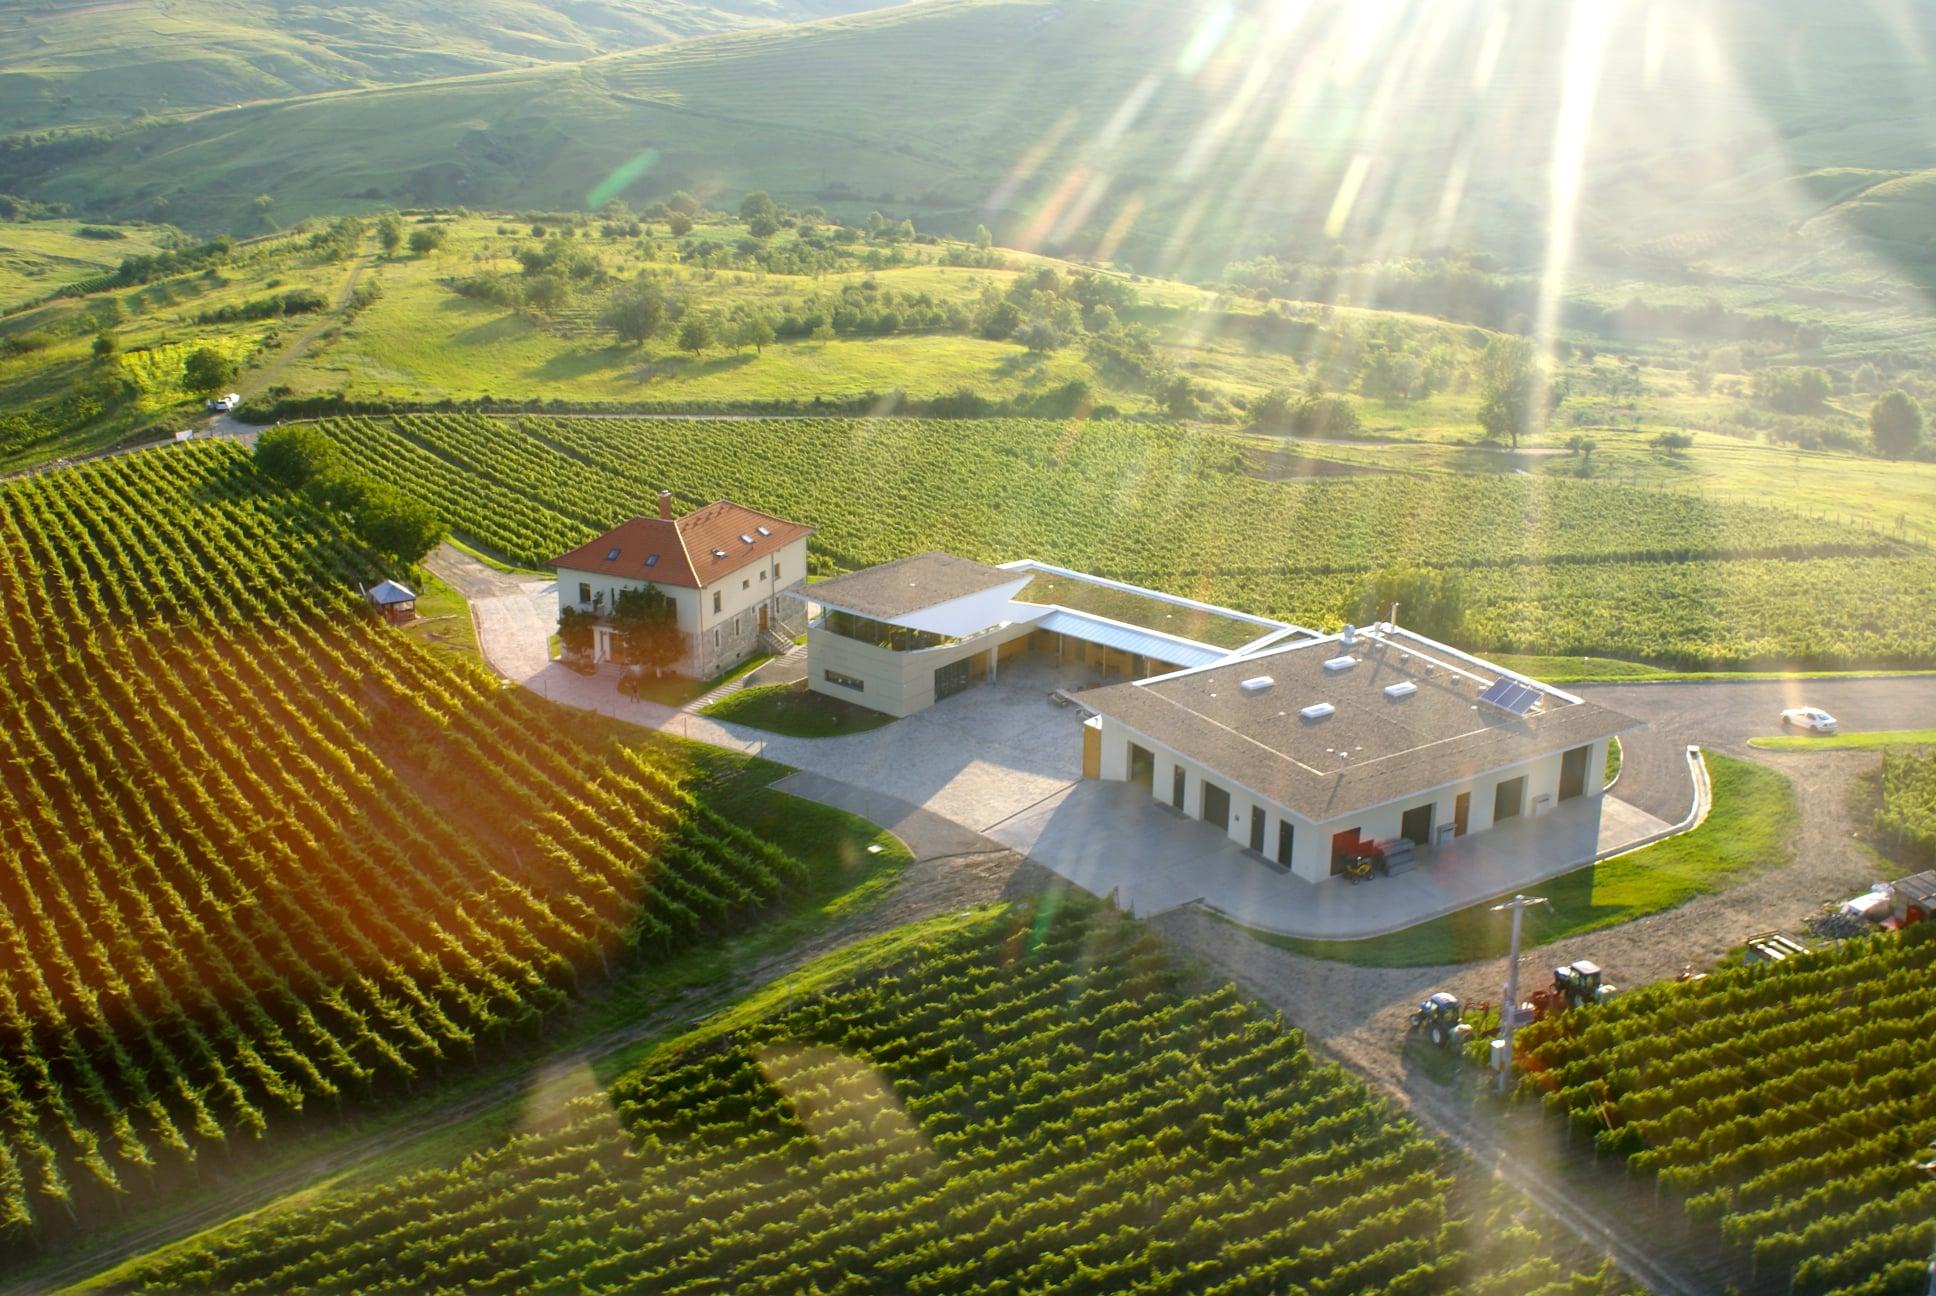 Excursie la cramele din Dealu Mare, degustări de vinuri premium, variantele...